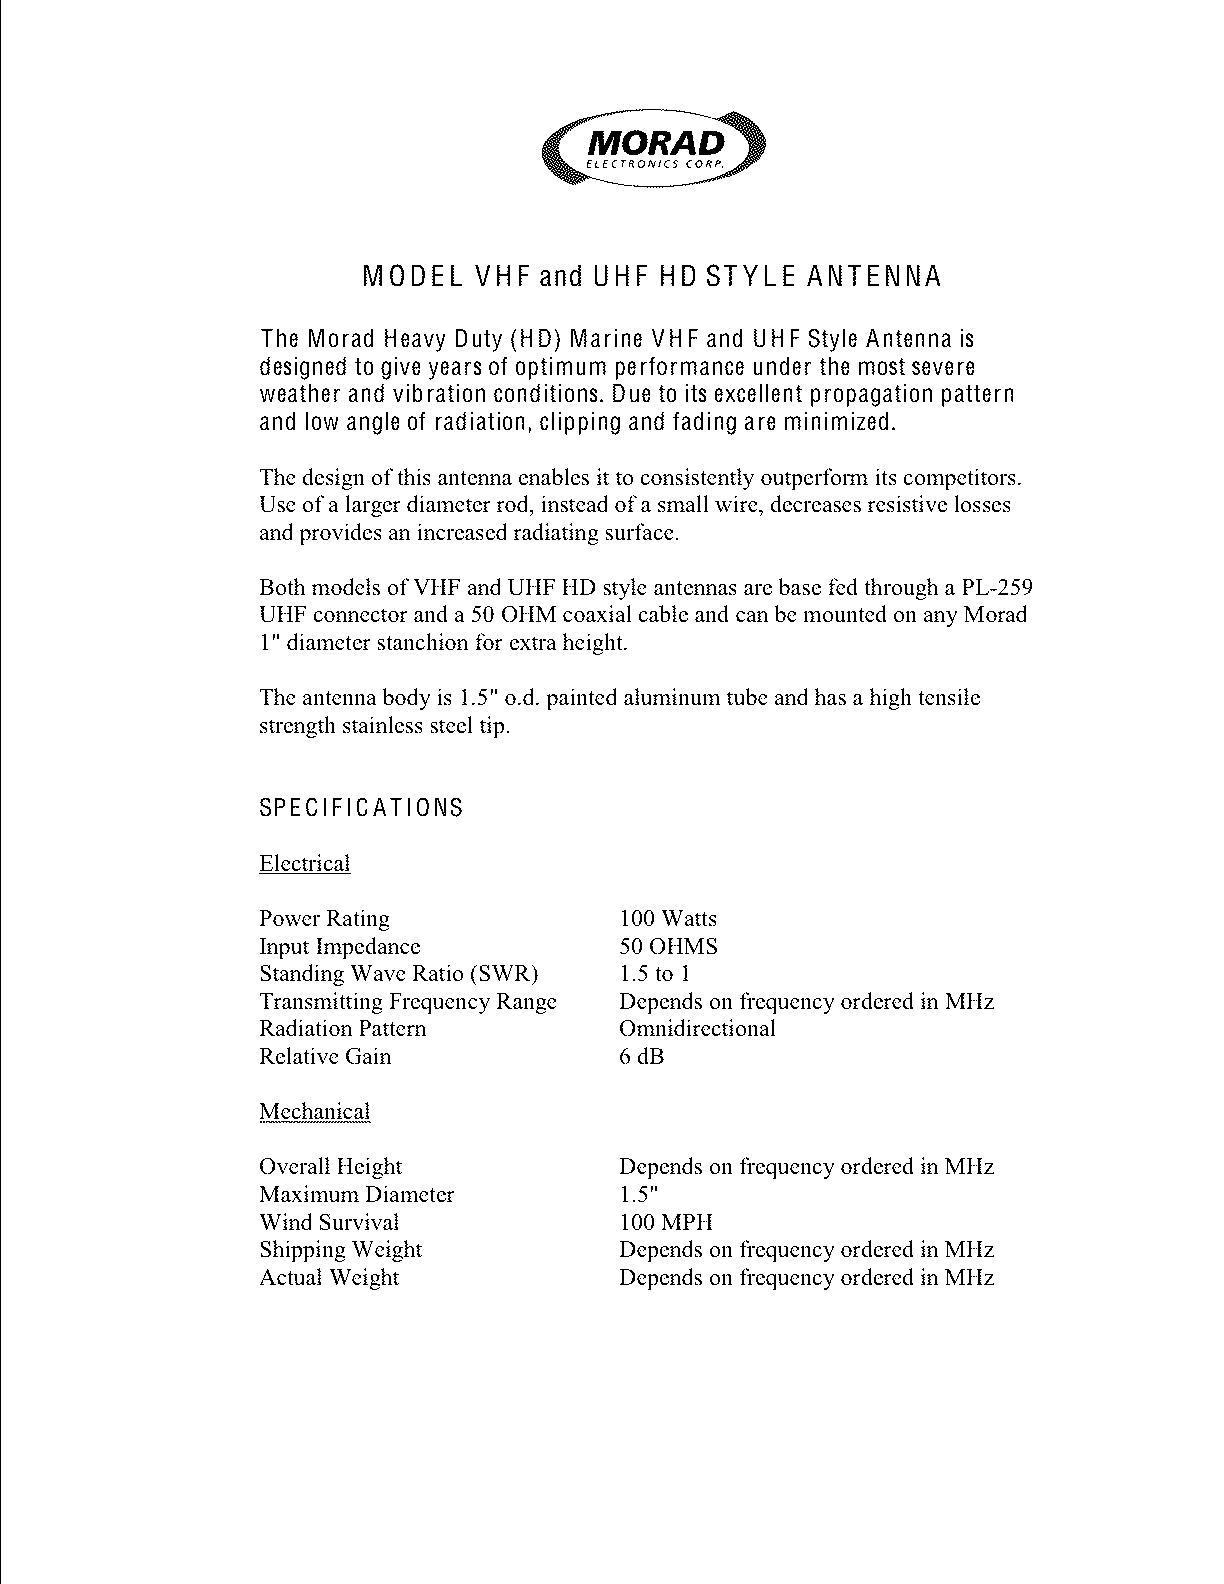 Spec VHF-HD and UHF HD-style antennas.